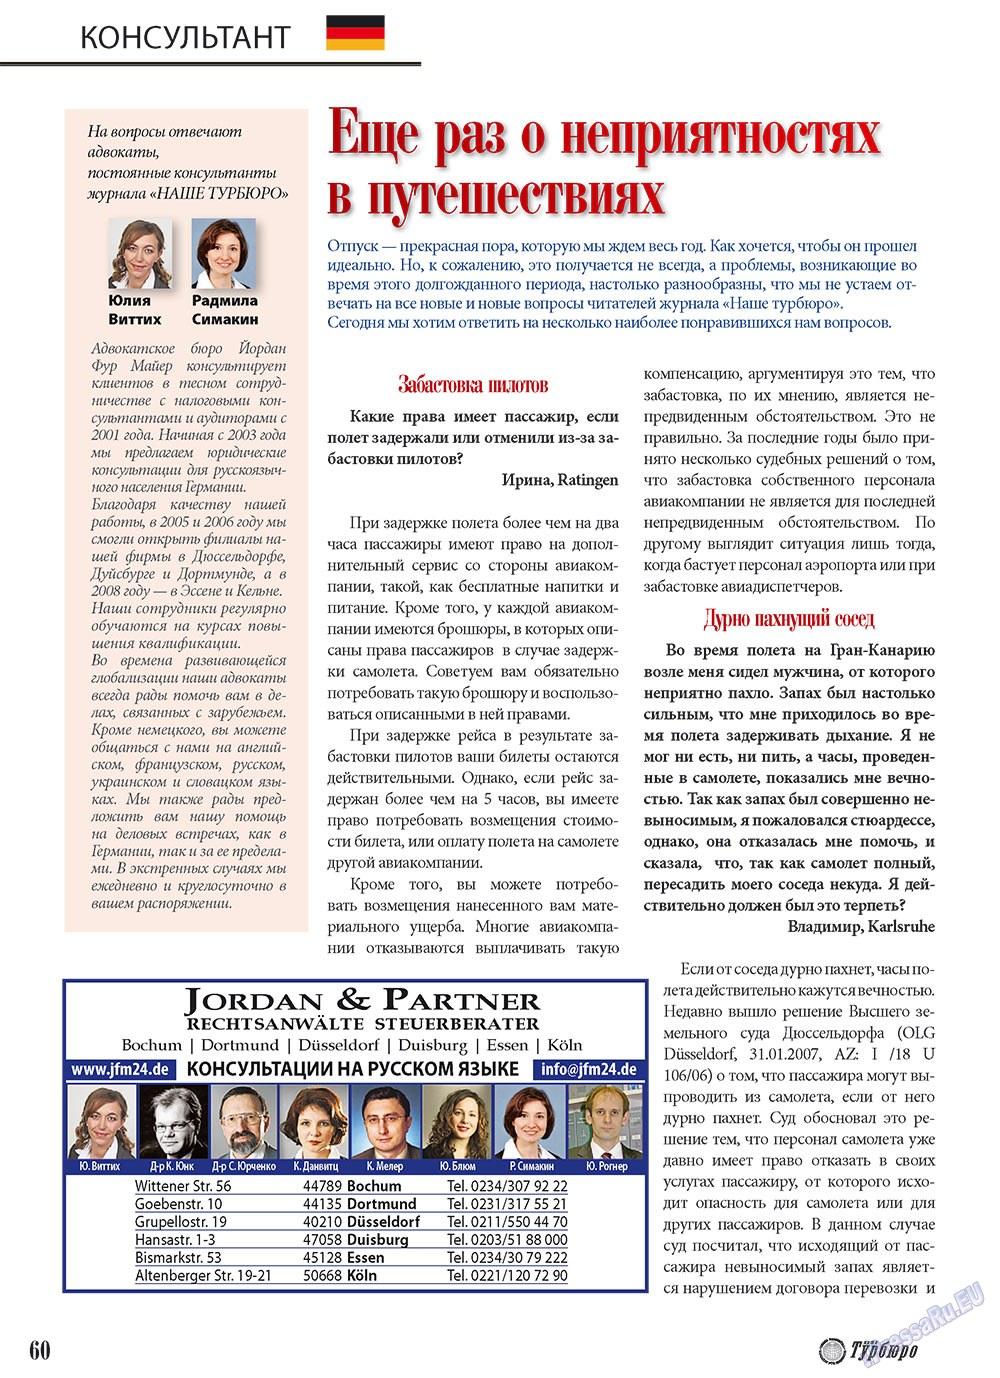 Наше Турбюро (журнал). 2010 год, номер 4, стр. 60